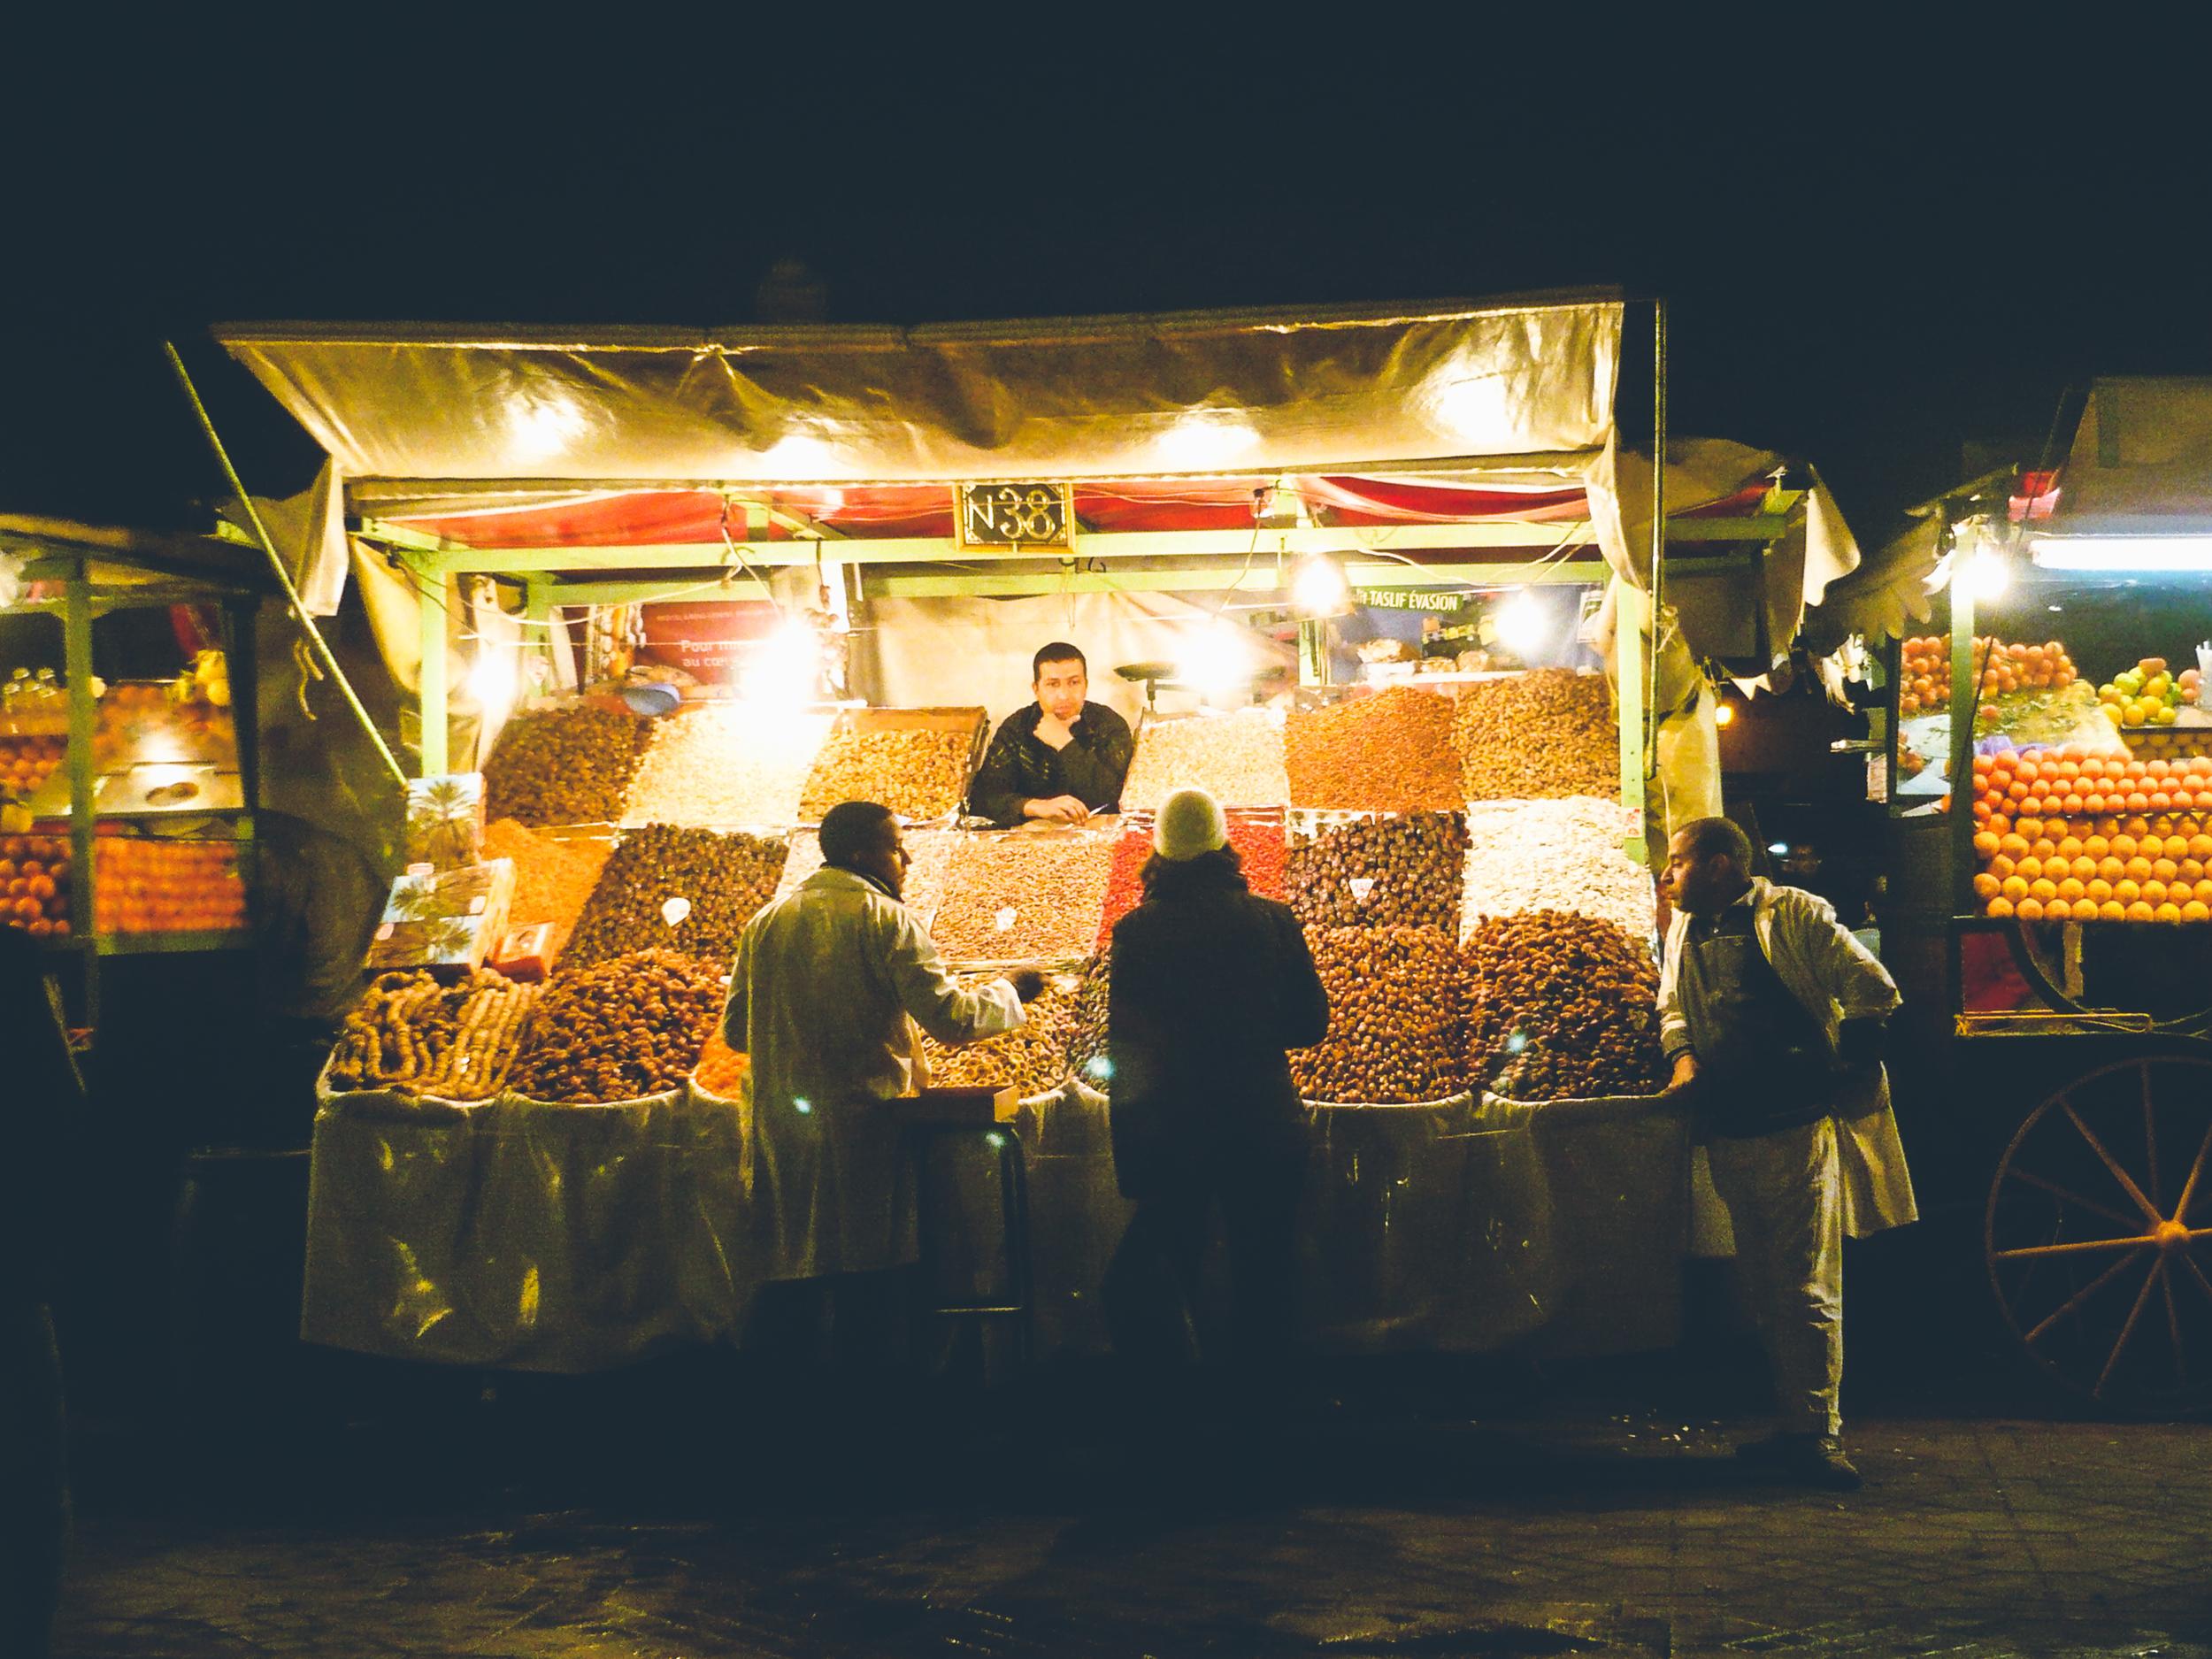 Night Market in Marrakech, Morocco 2009